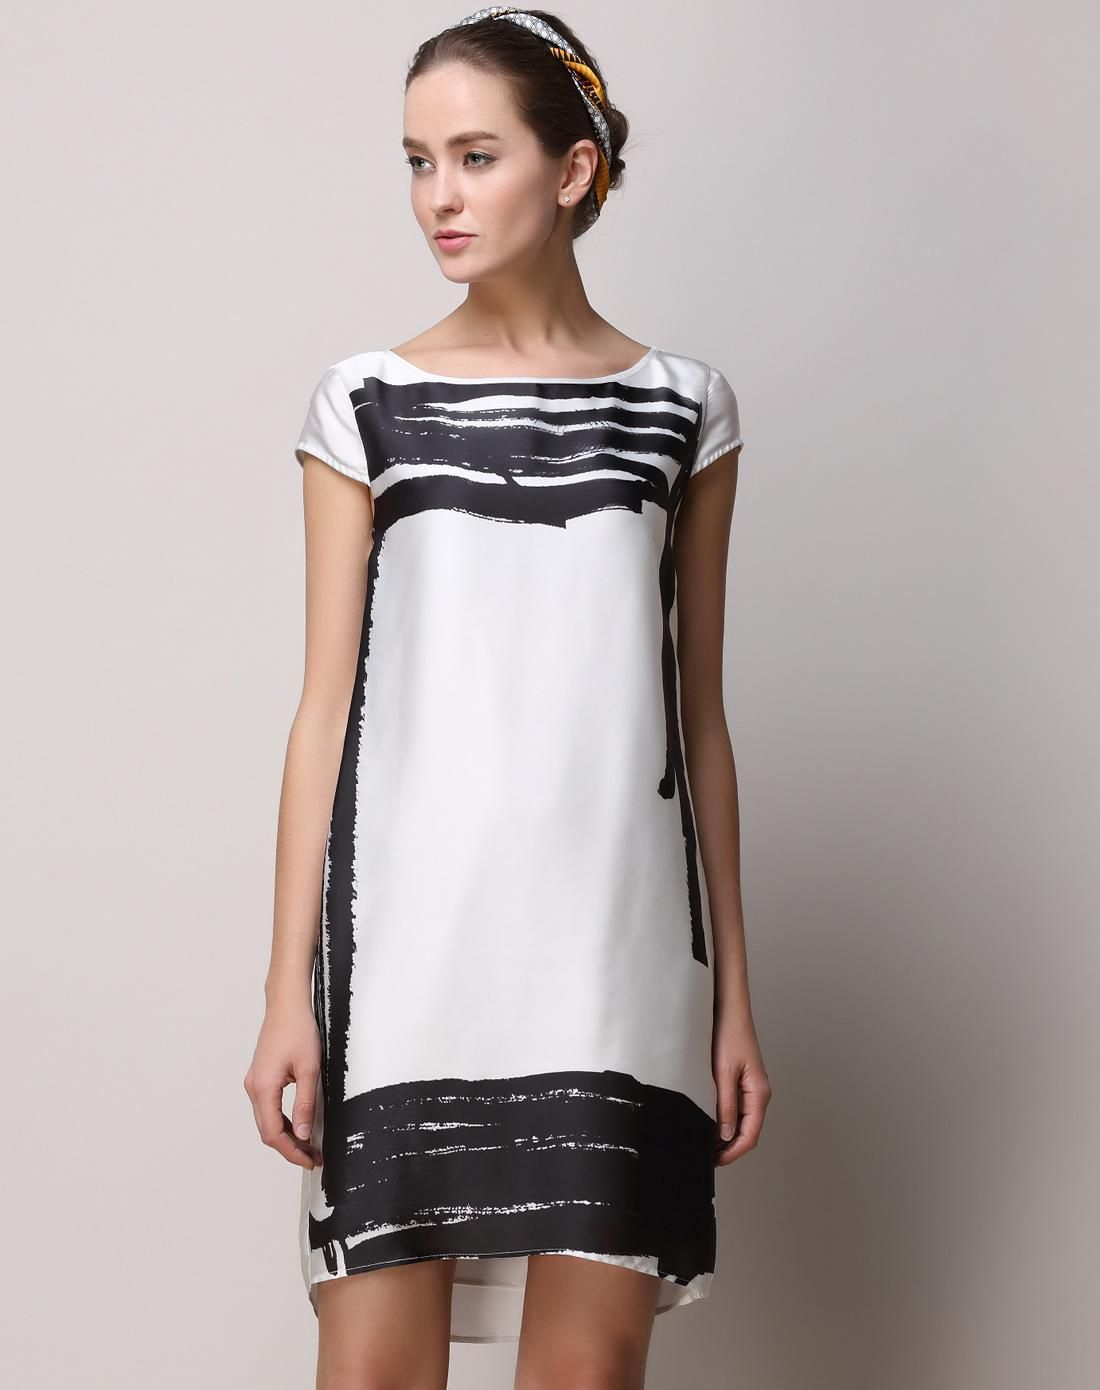 #AdoreWe #VIPme Shift Dresses - SAINTY White High Low Cap Sleeve Art Mini Shift Dress - AdoreWe.com